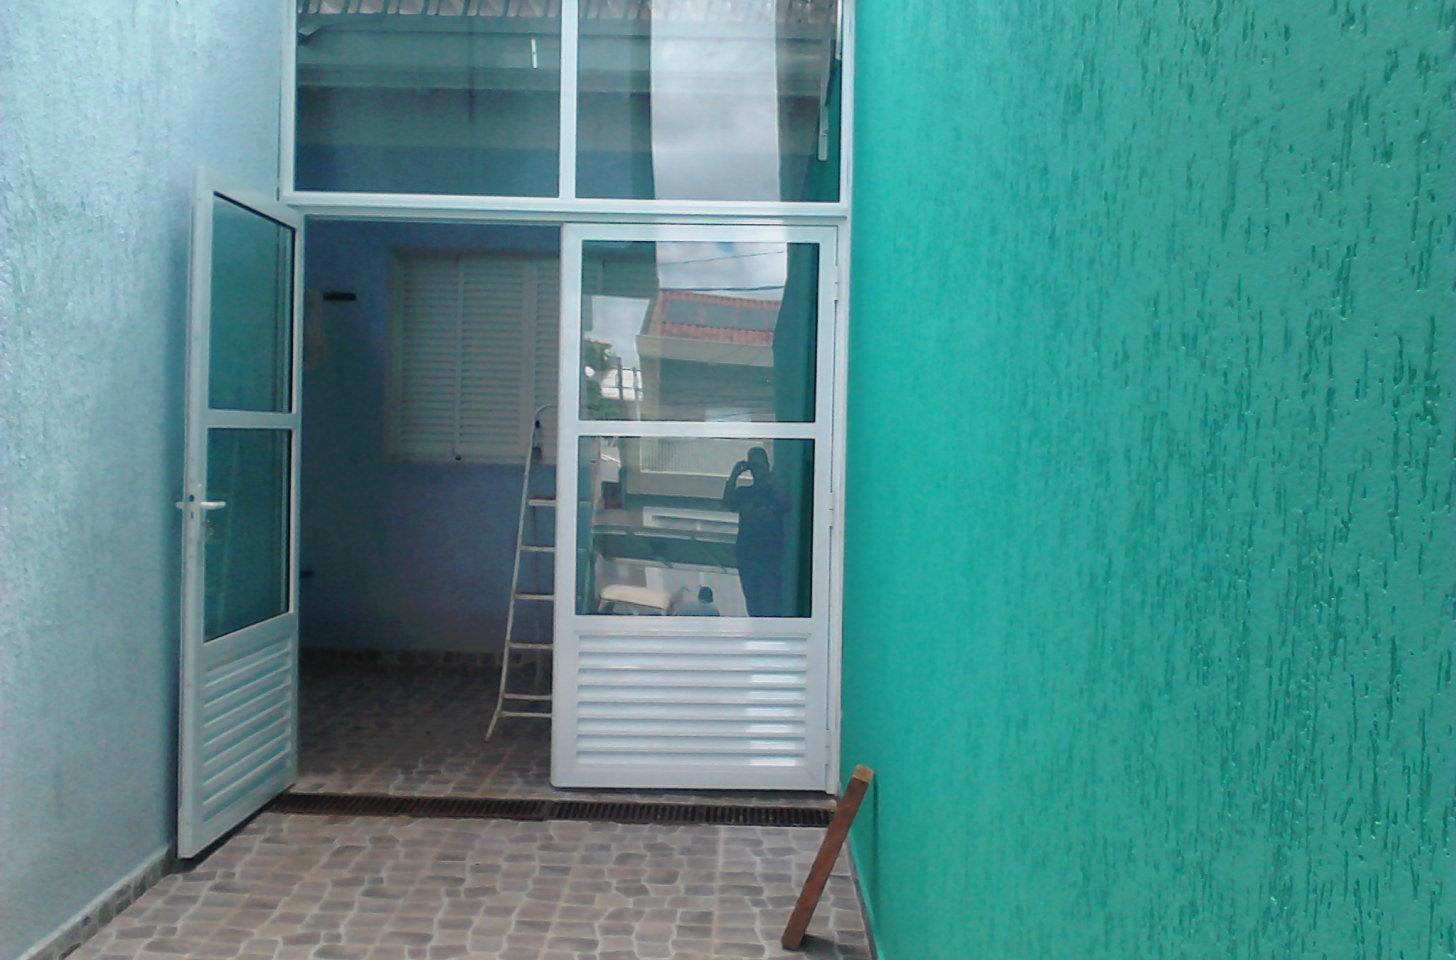 Porta de alumínio com vidro verde